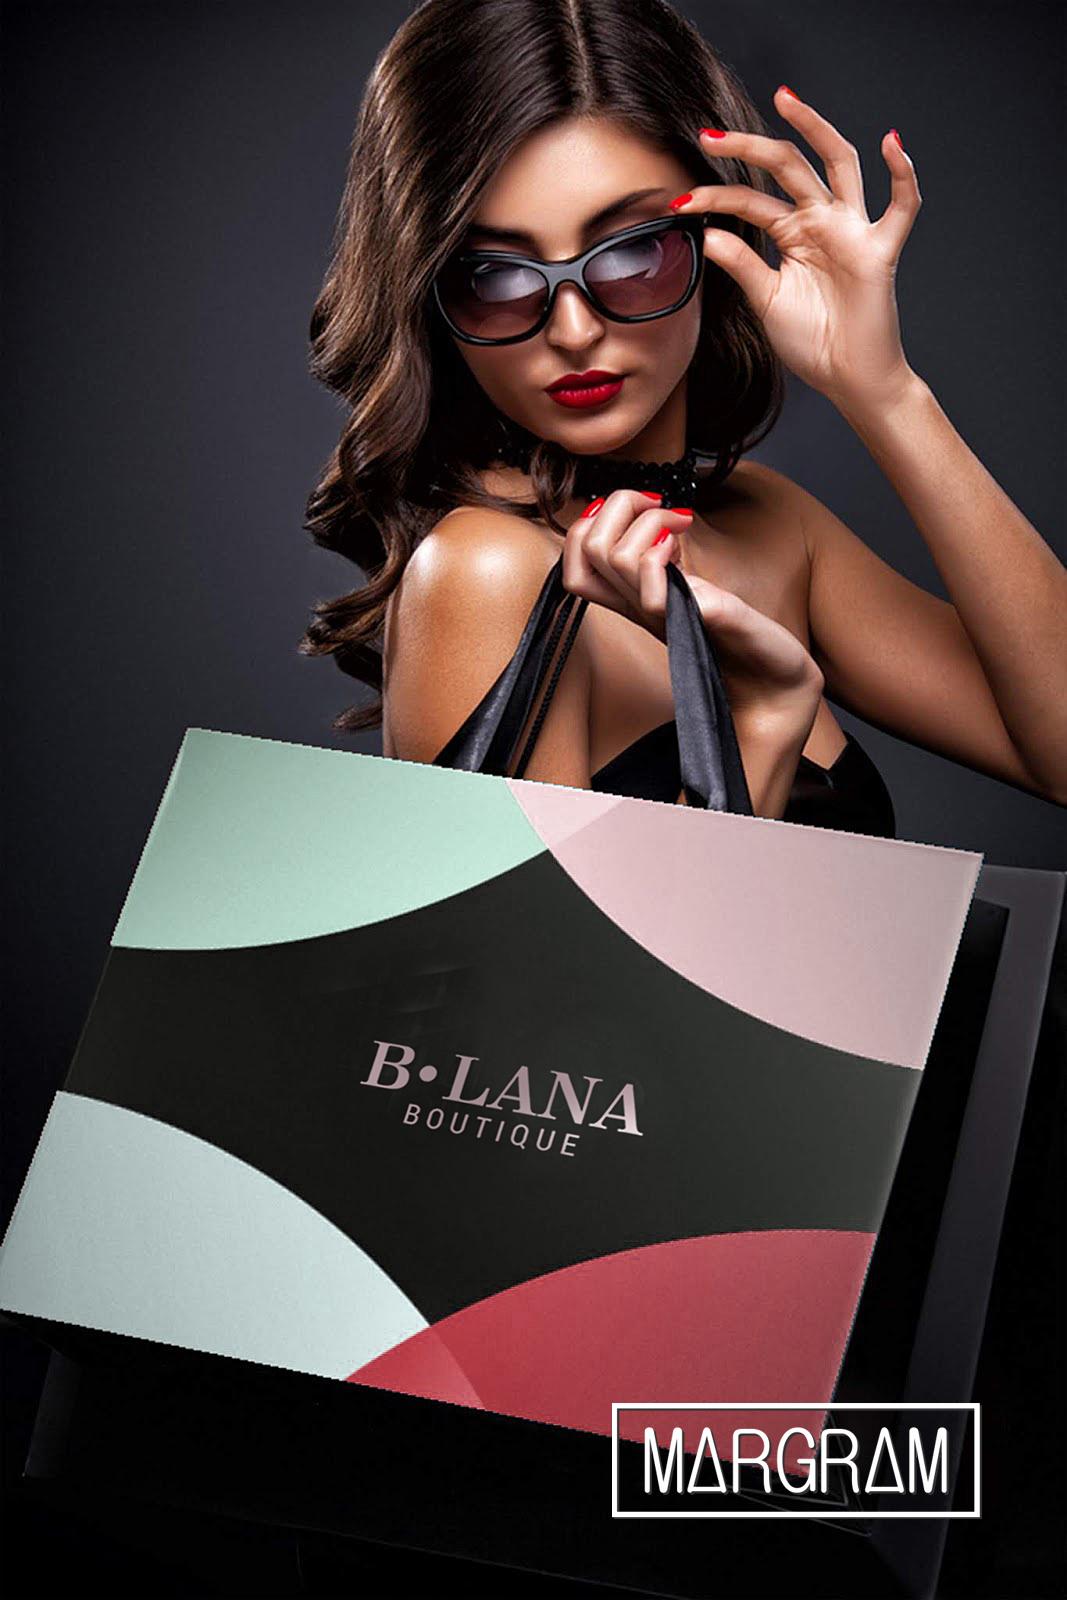 nhan-dien-nhan-hieu-b.lana-boutique-margram-03